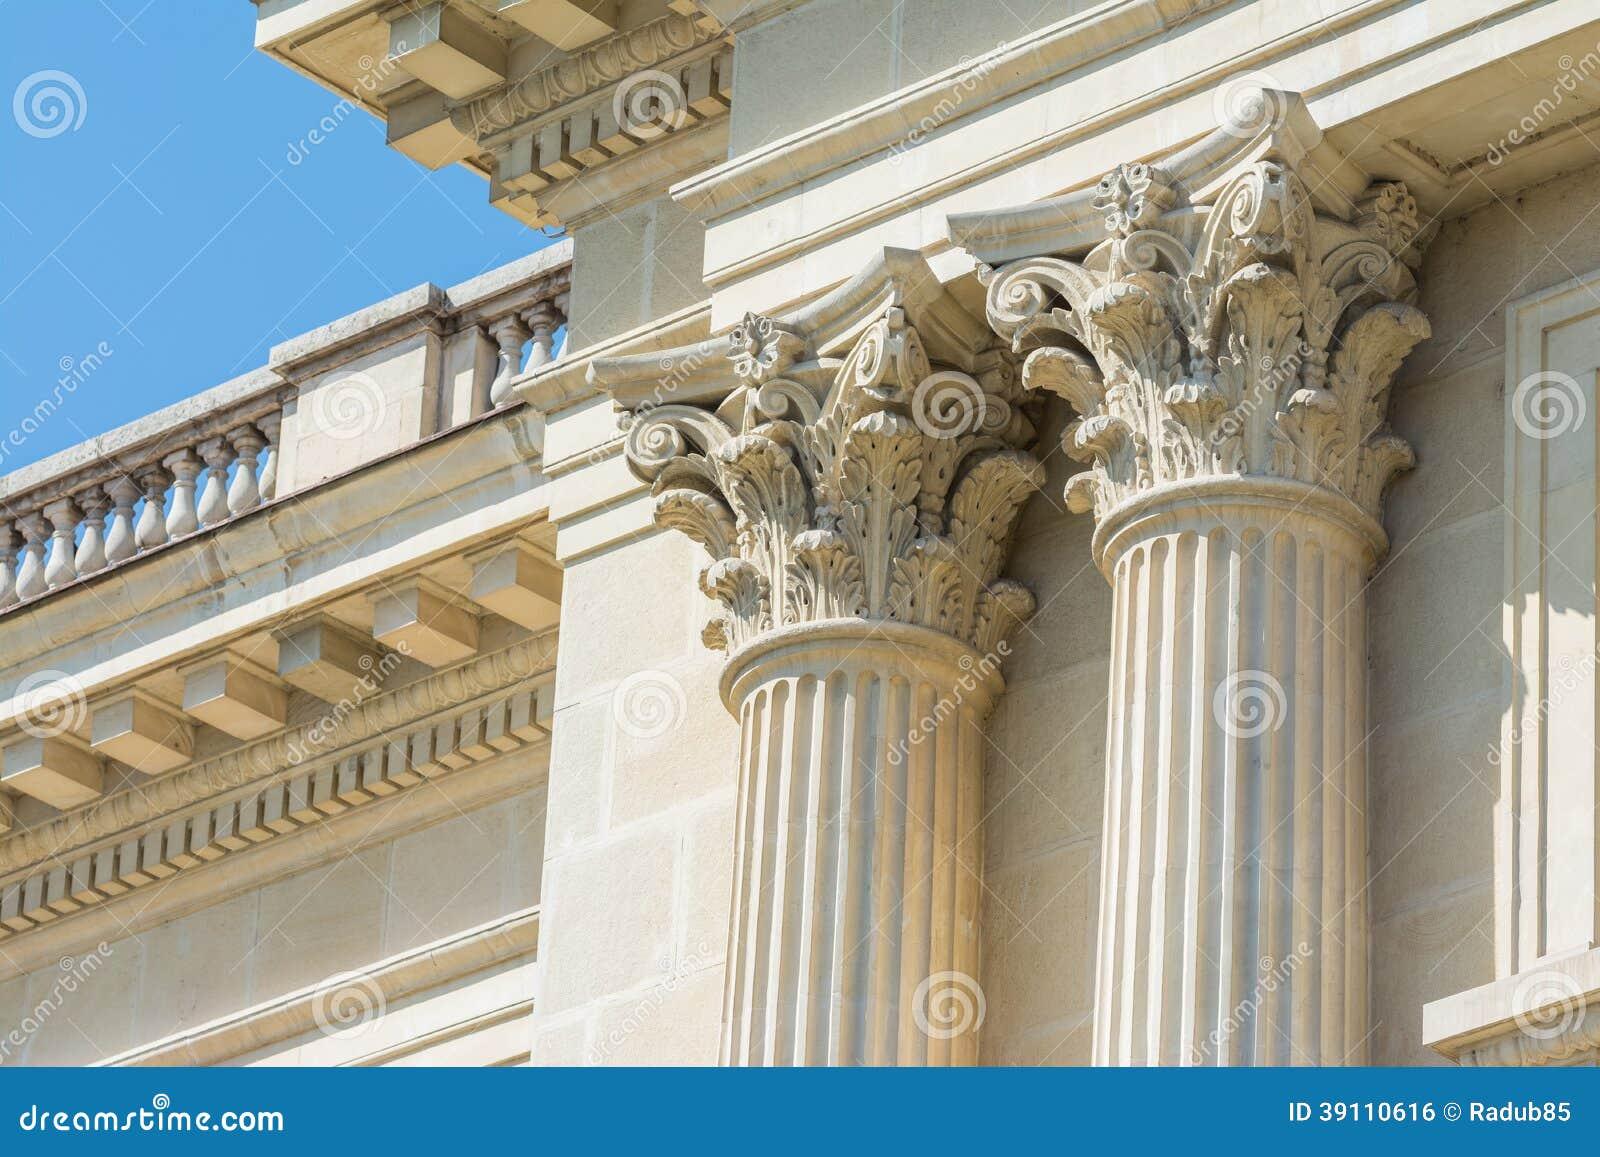 corinthean columns